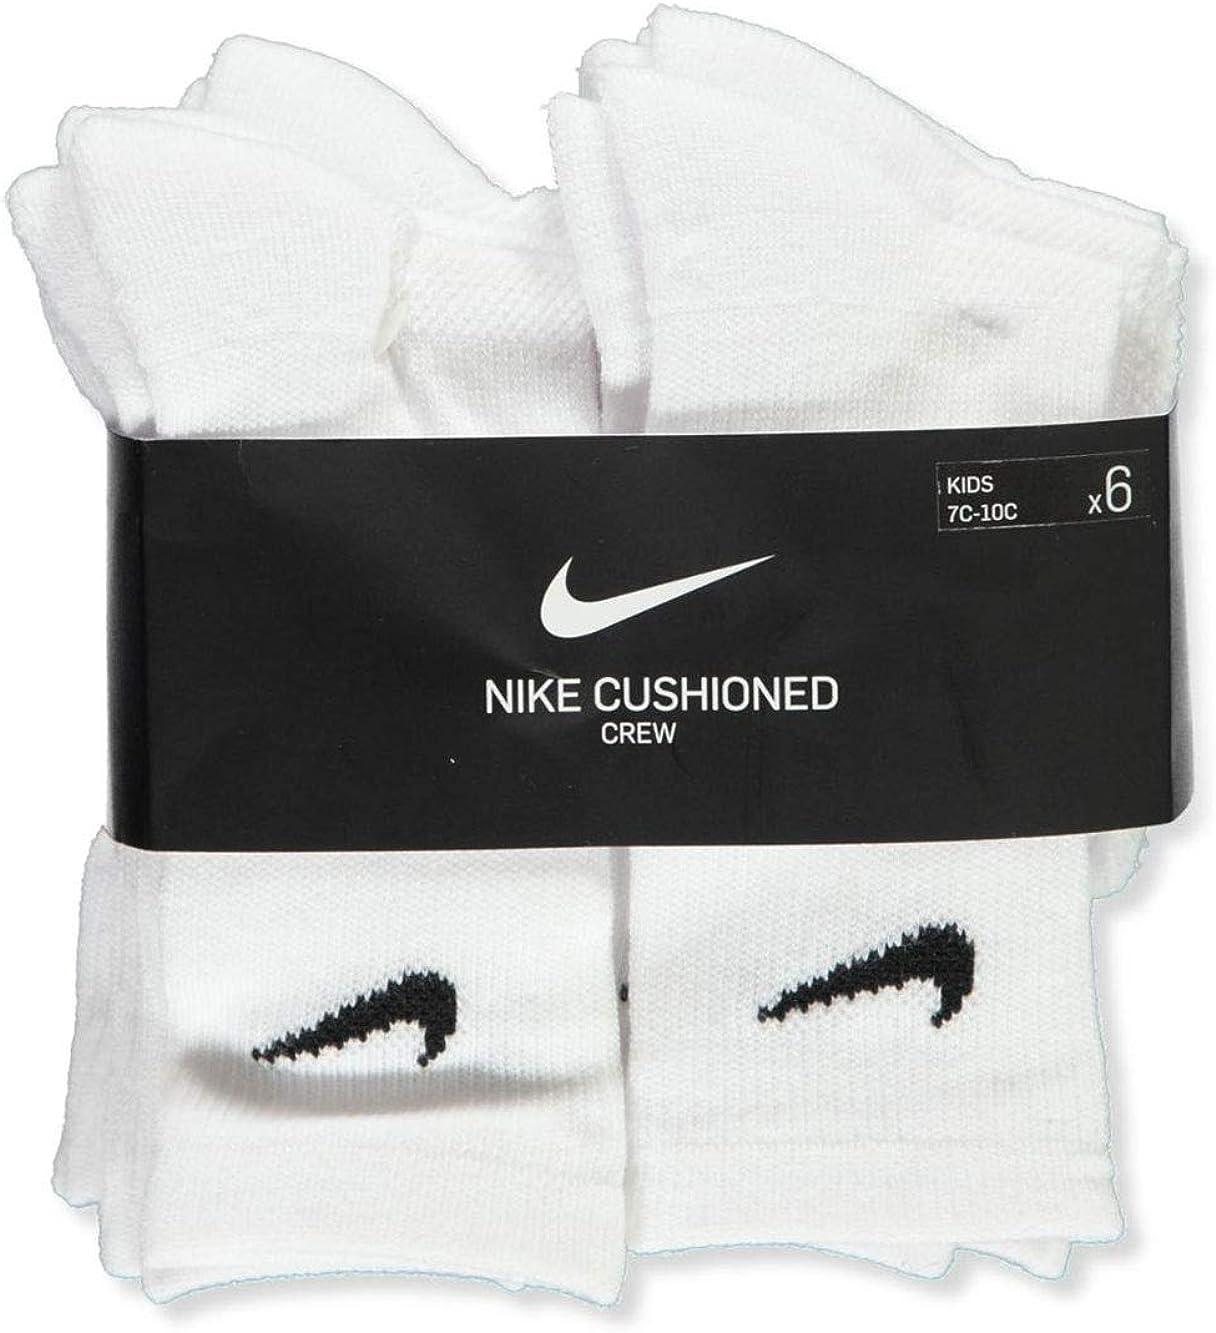 Nike 6 Pairs Young Athletes Crew Cushioned Socks; White (4-5)